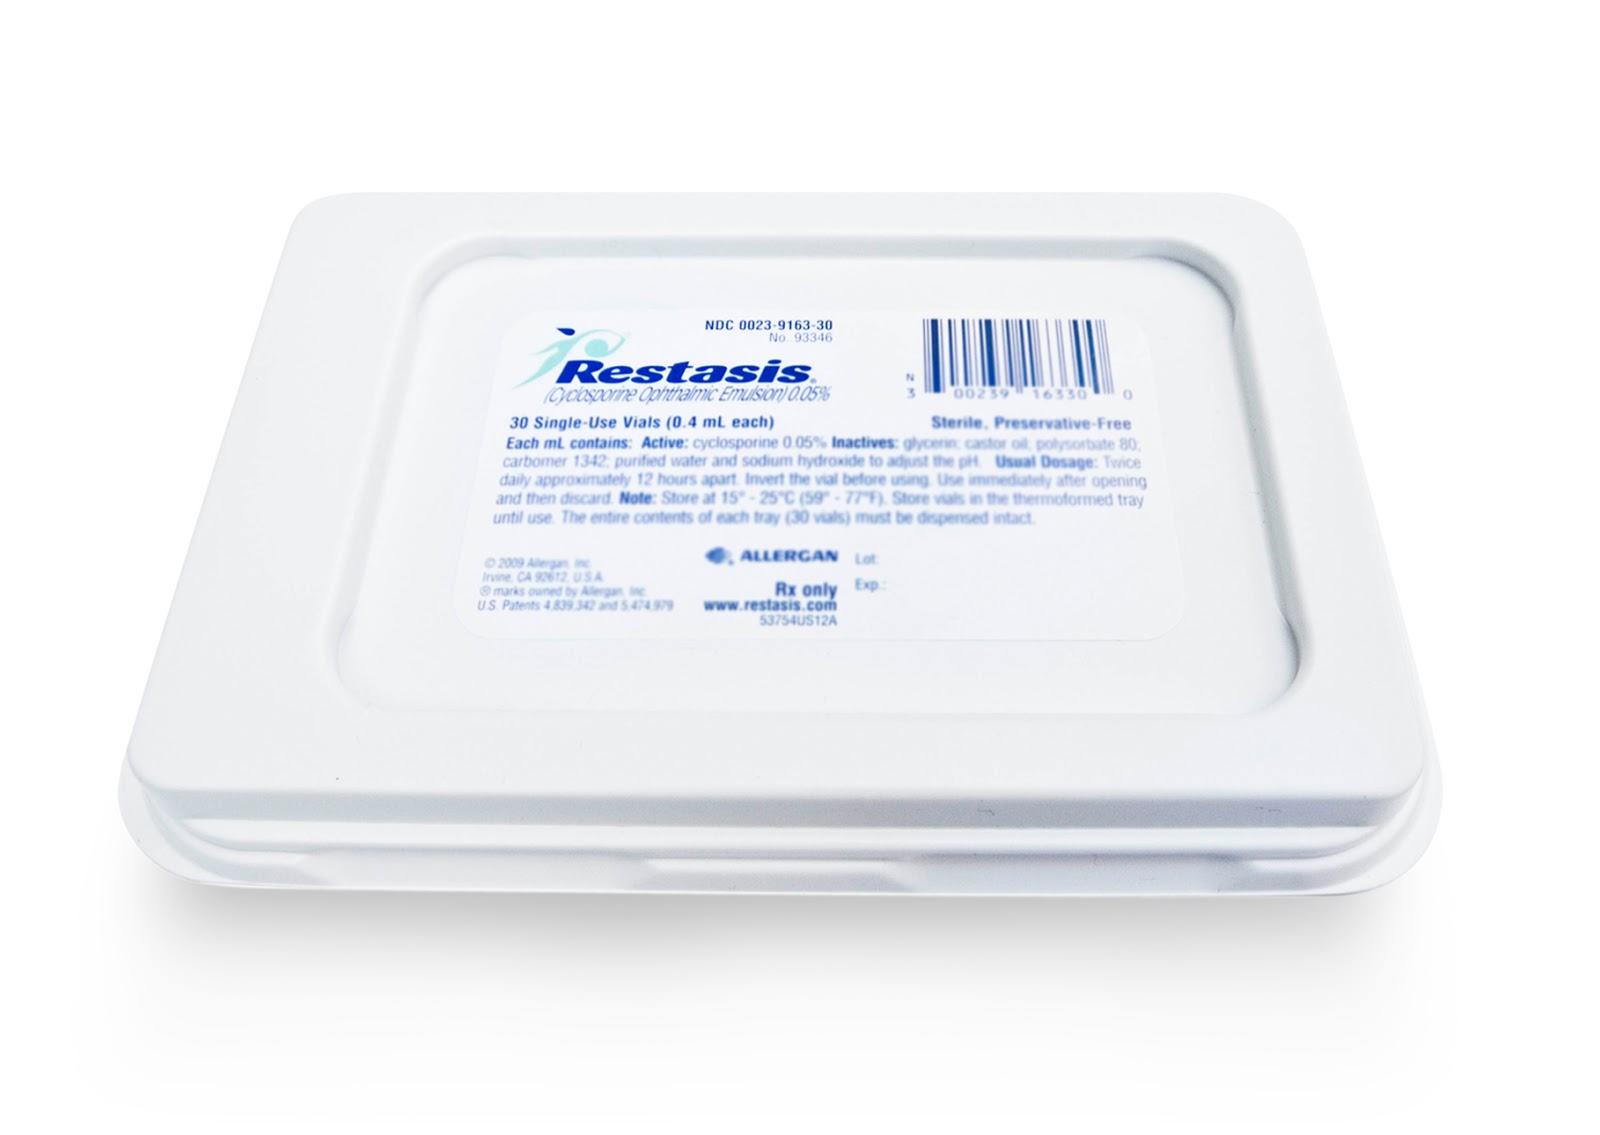 image regarding Restasis Coupons Printable known as Restasis coupon : Tapas promotions